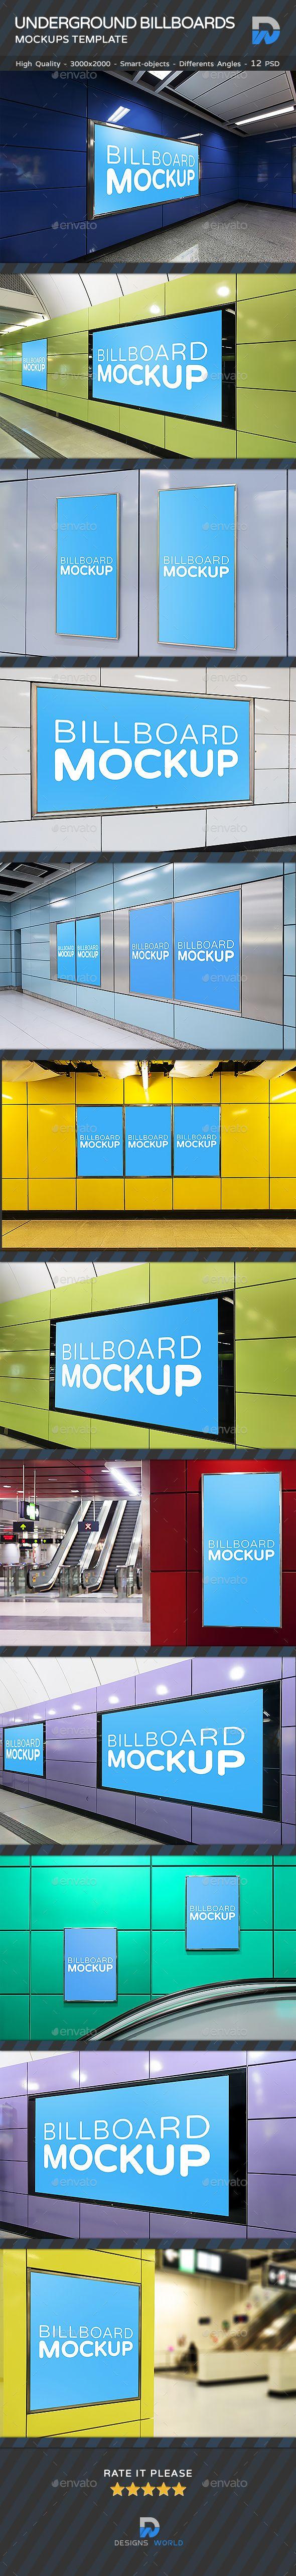 Underground Advertising Mock-ups